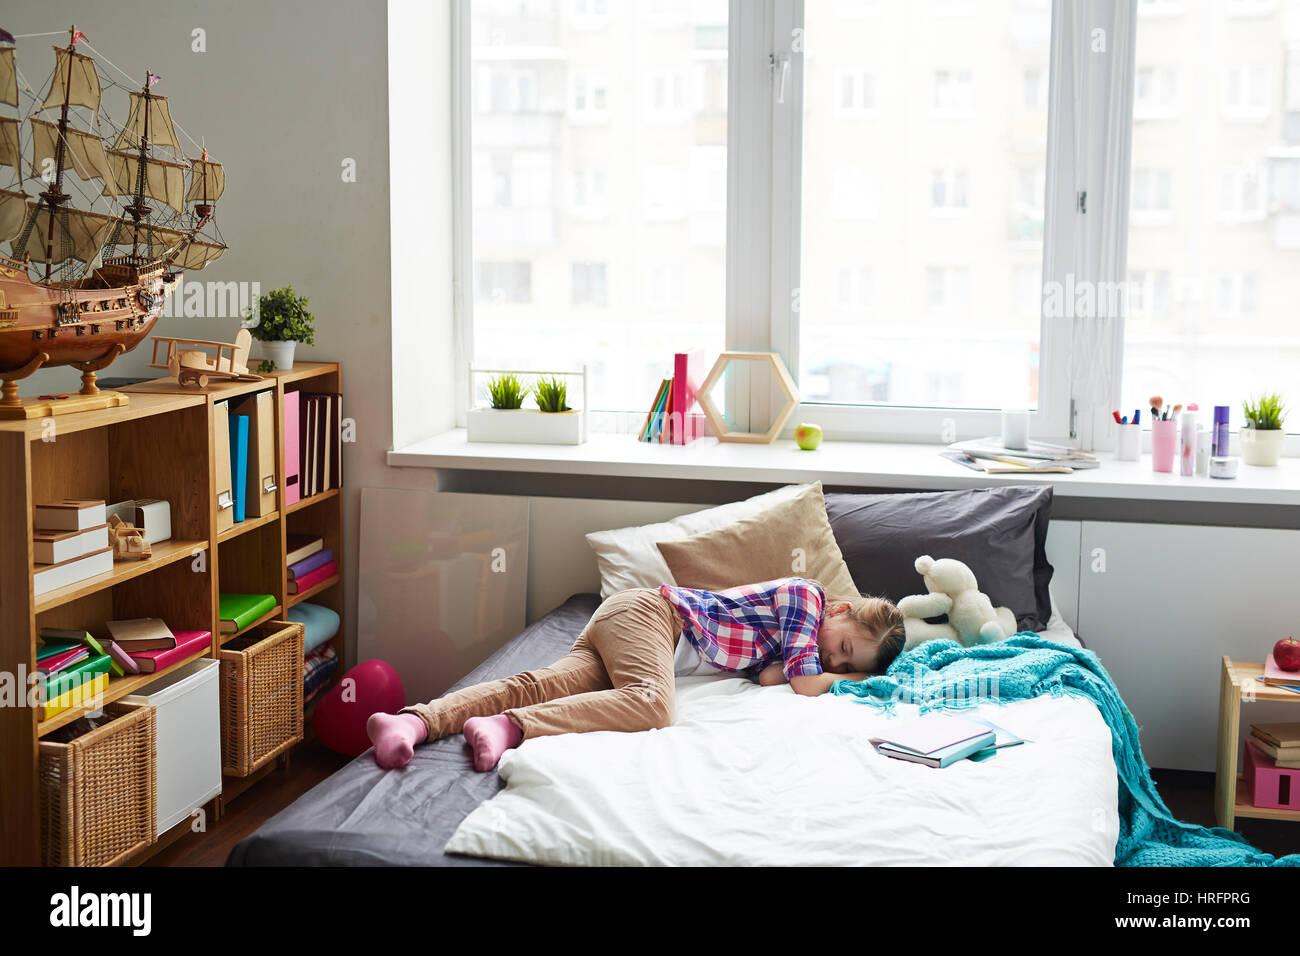 Tired Schoolgirl Sleeping In Stylish Cozy Bedroom With Large Window Modern Furniture And Big Ship